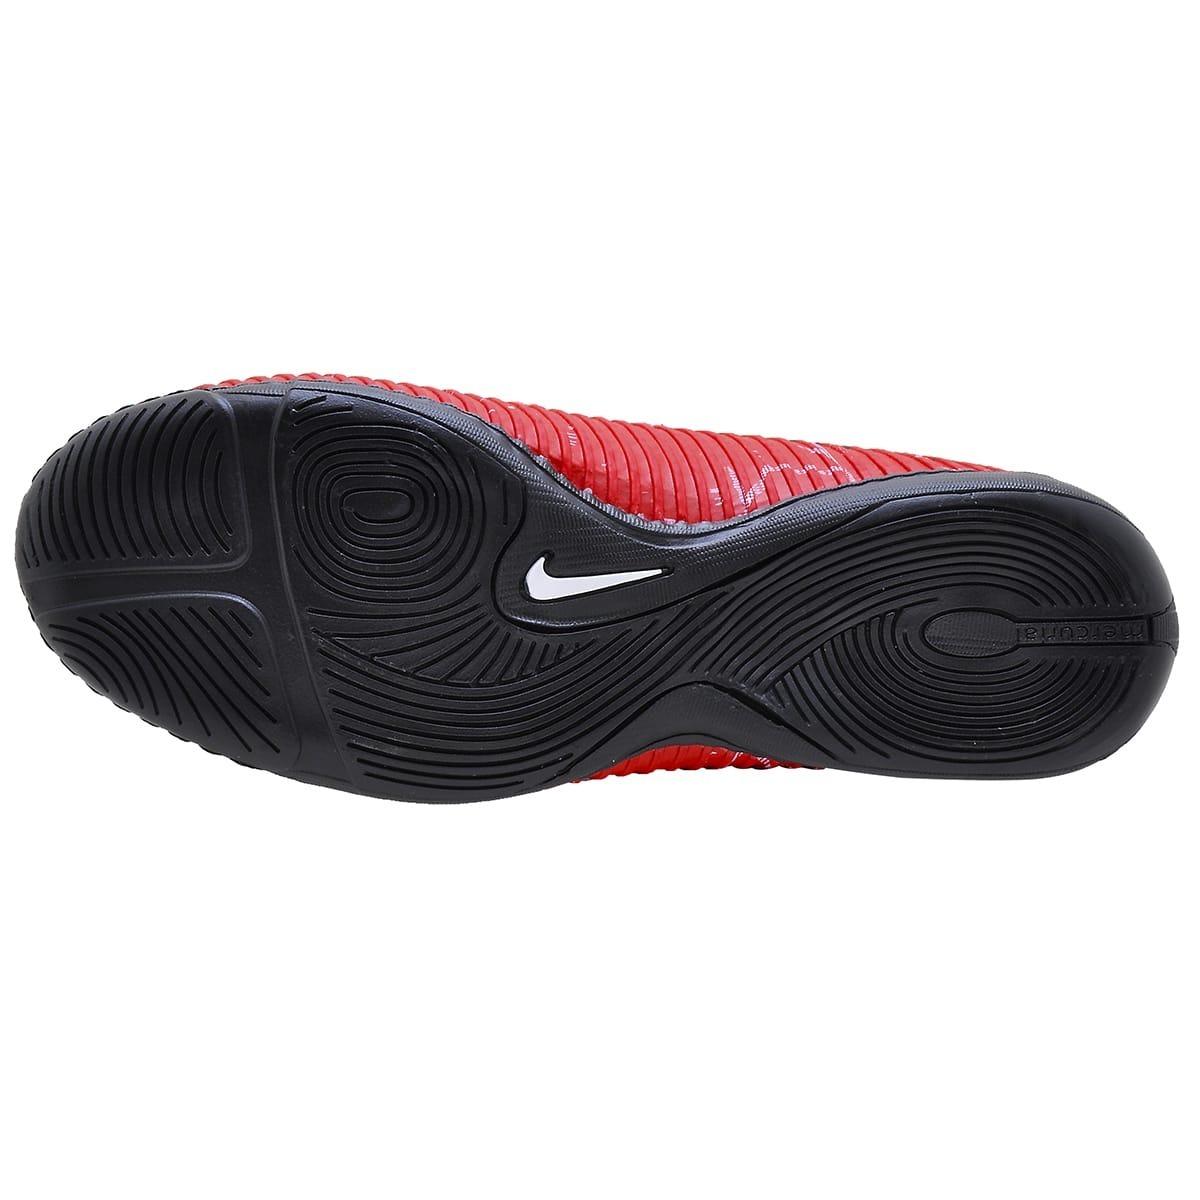 Kit 3 Pares Chuteira Futsal Nike Cano Alto Adulto Promoção - R  230 ... d220508531e2e